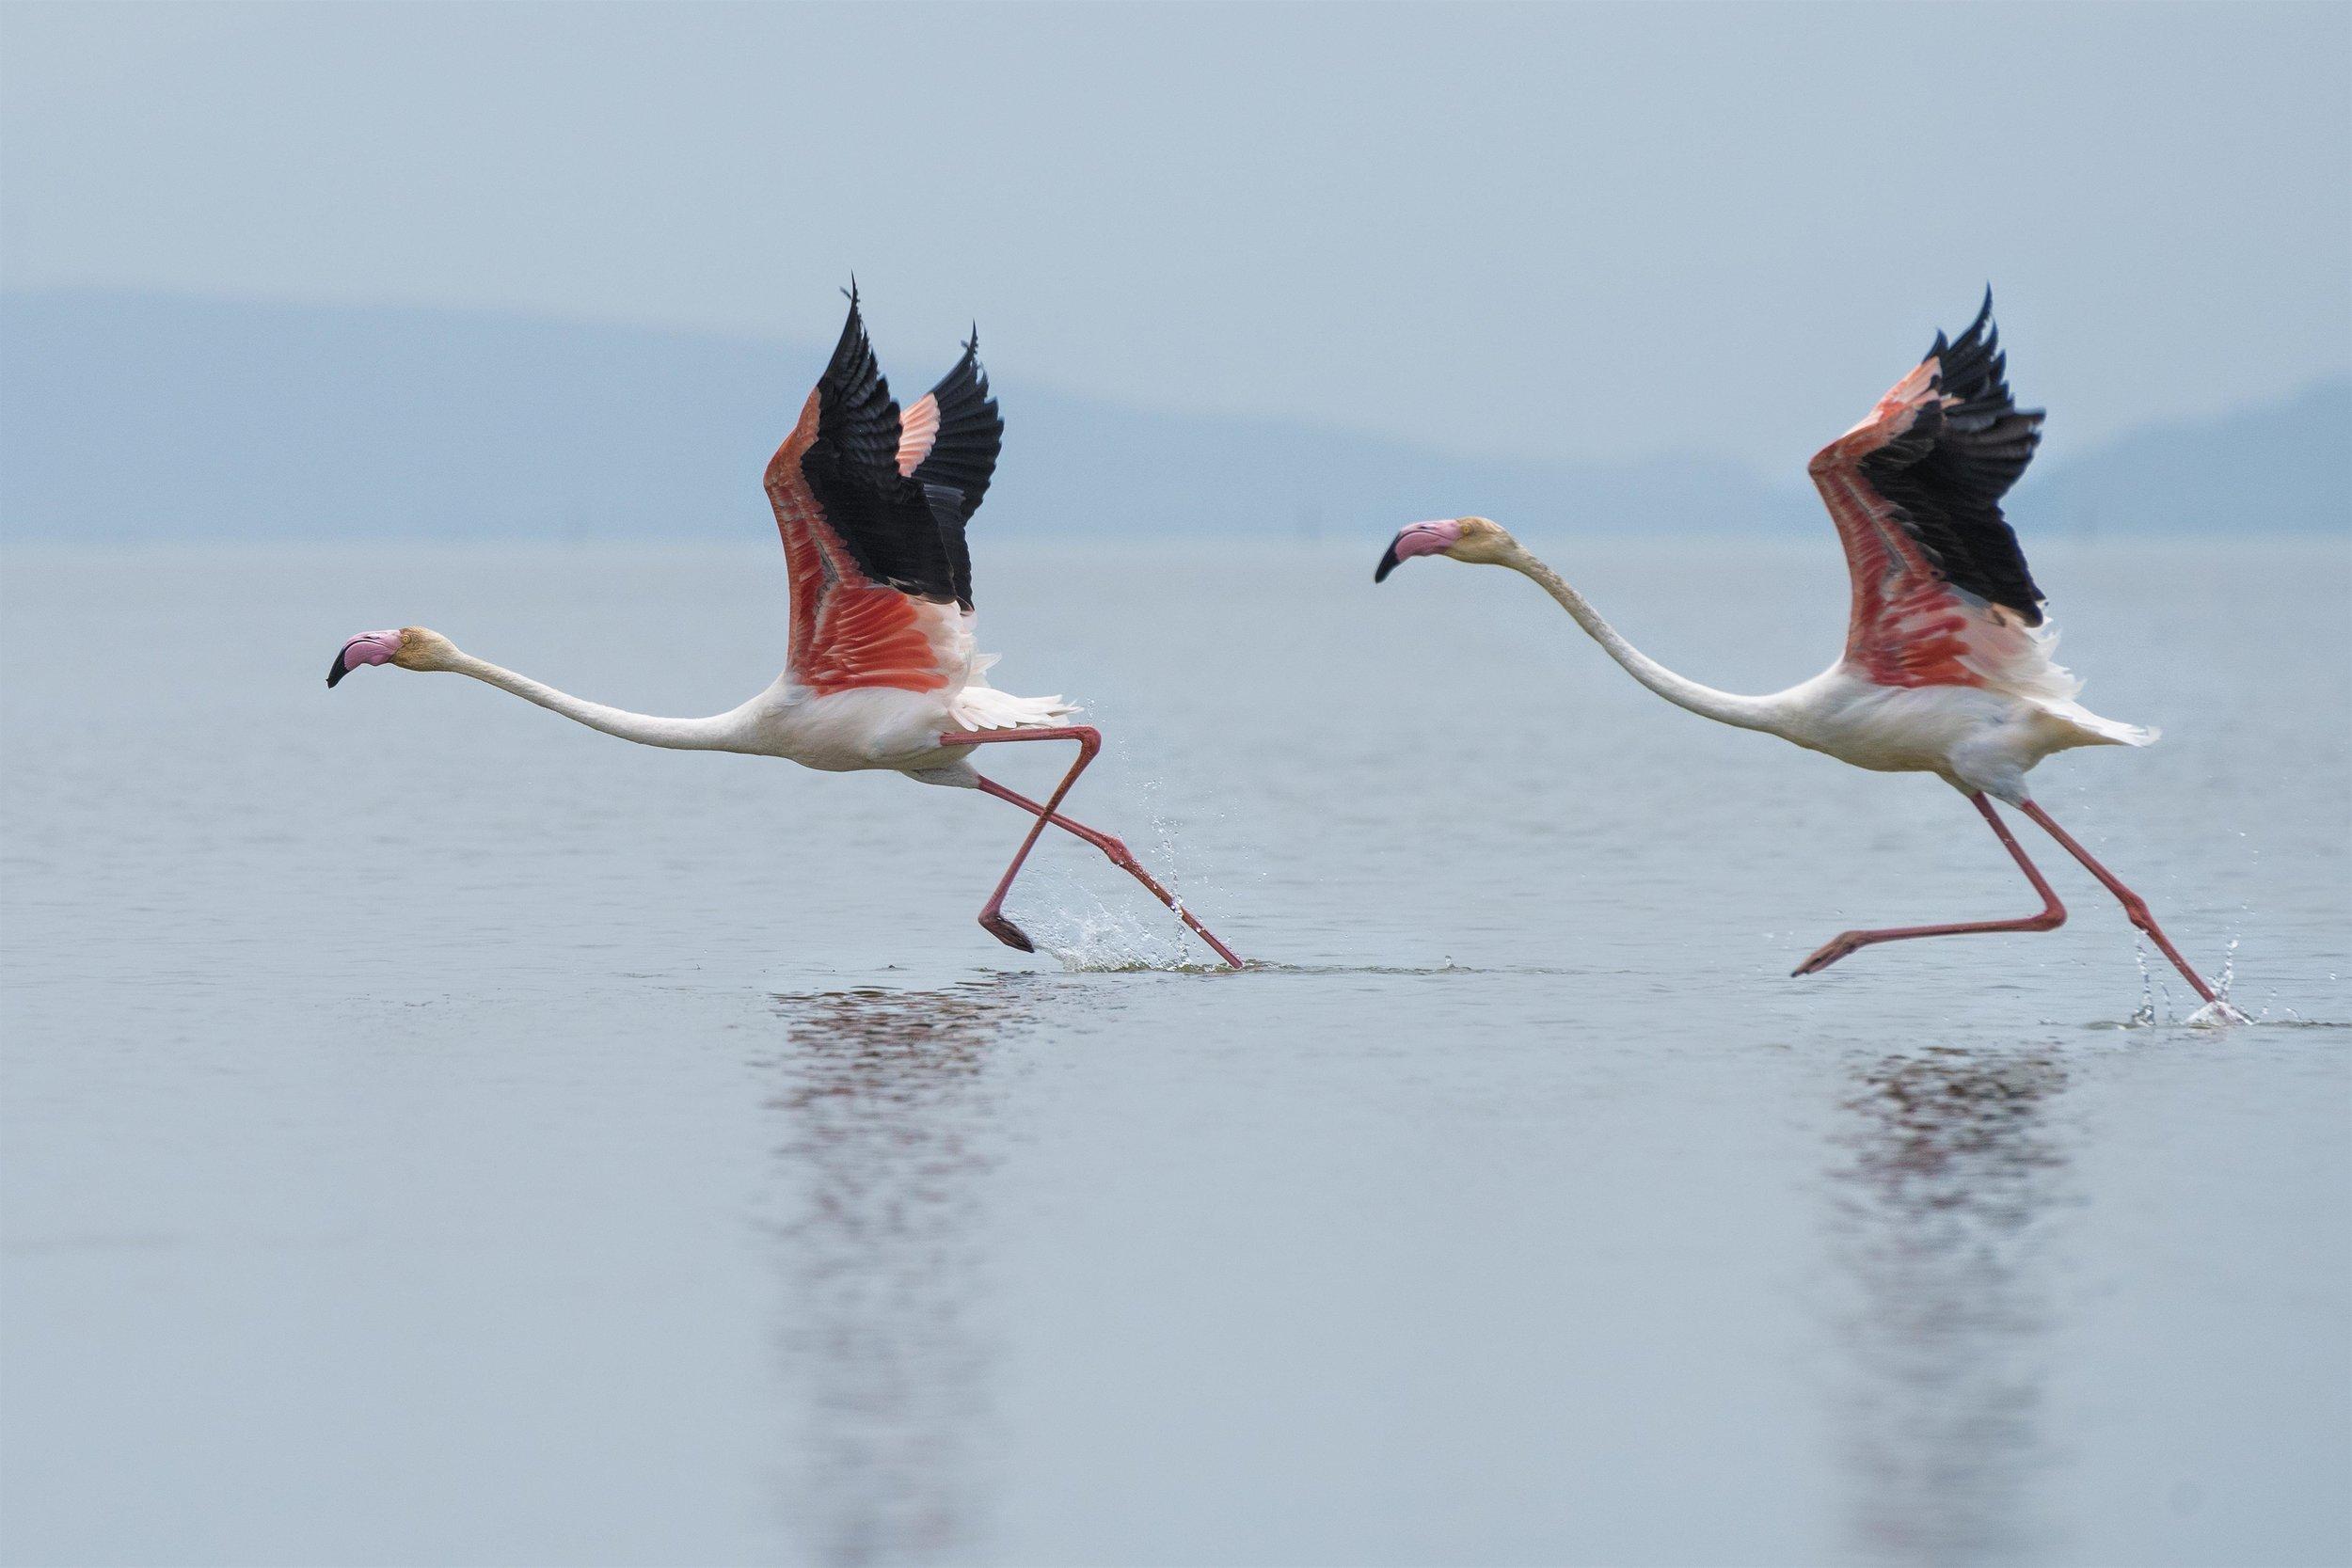 flamingo-birds-Vögel-delegate-starting-beginnen-water